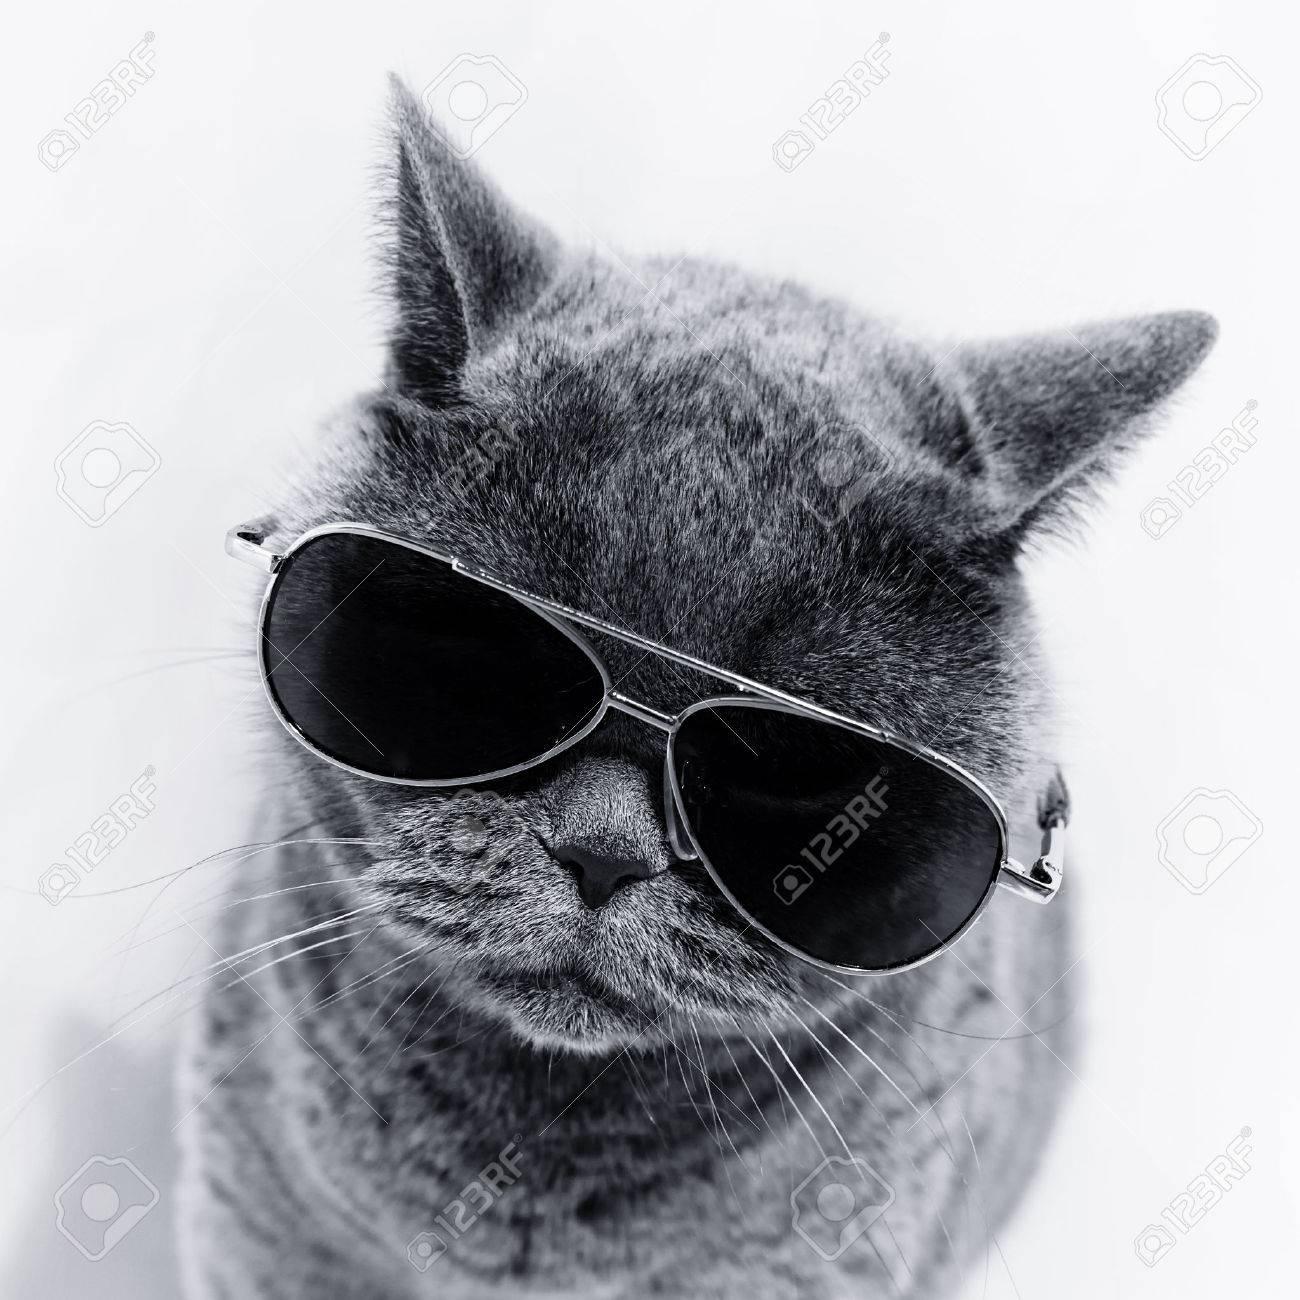 Portrait of British shorthair gray cat wearing sunglasses - 50611717